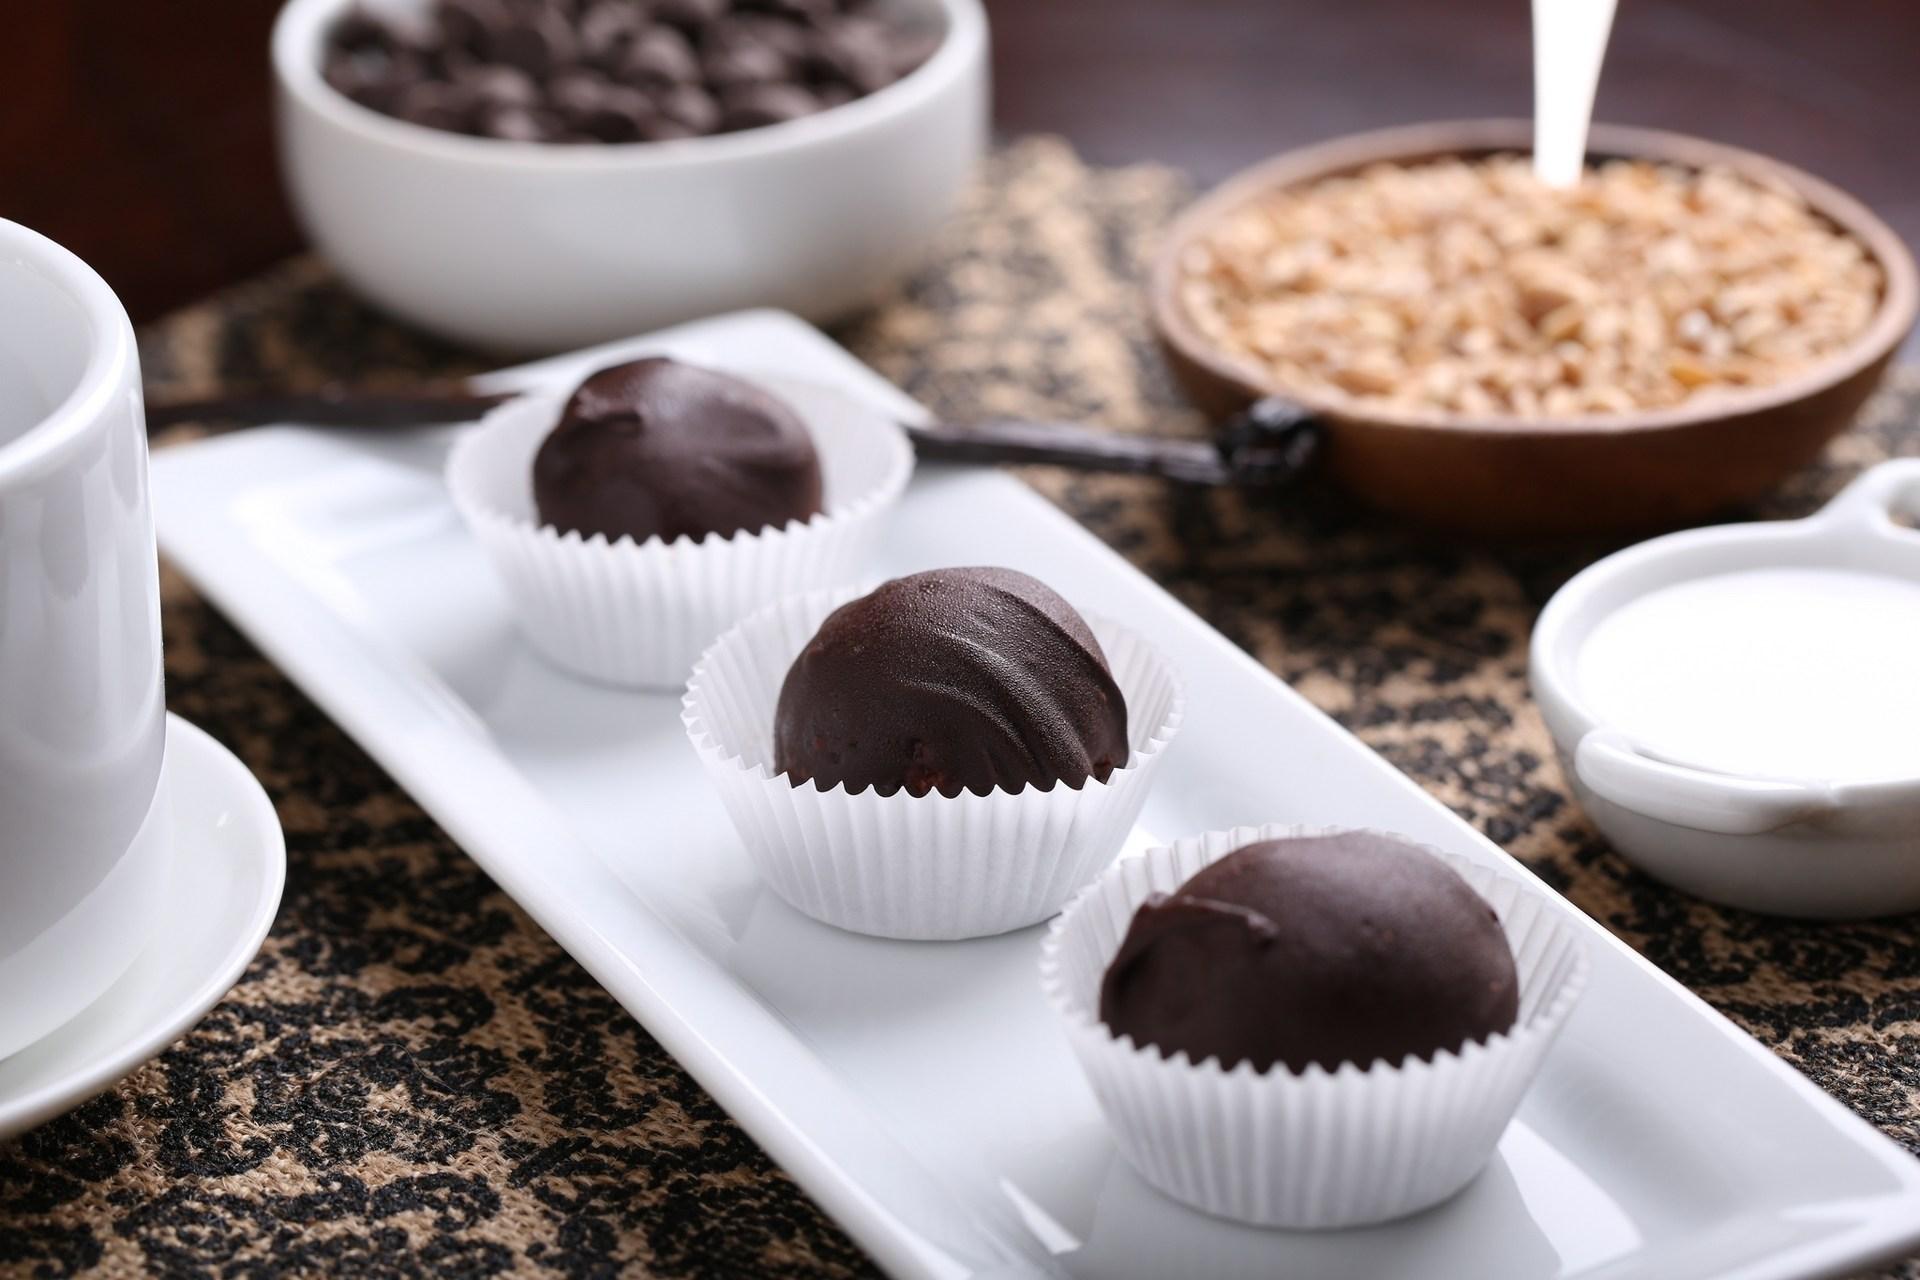 hinh nen chocolate 37